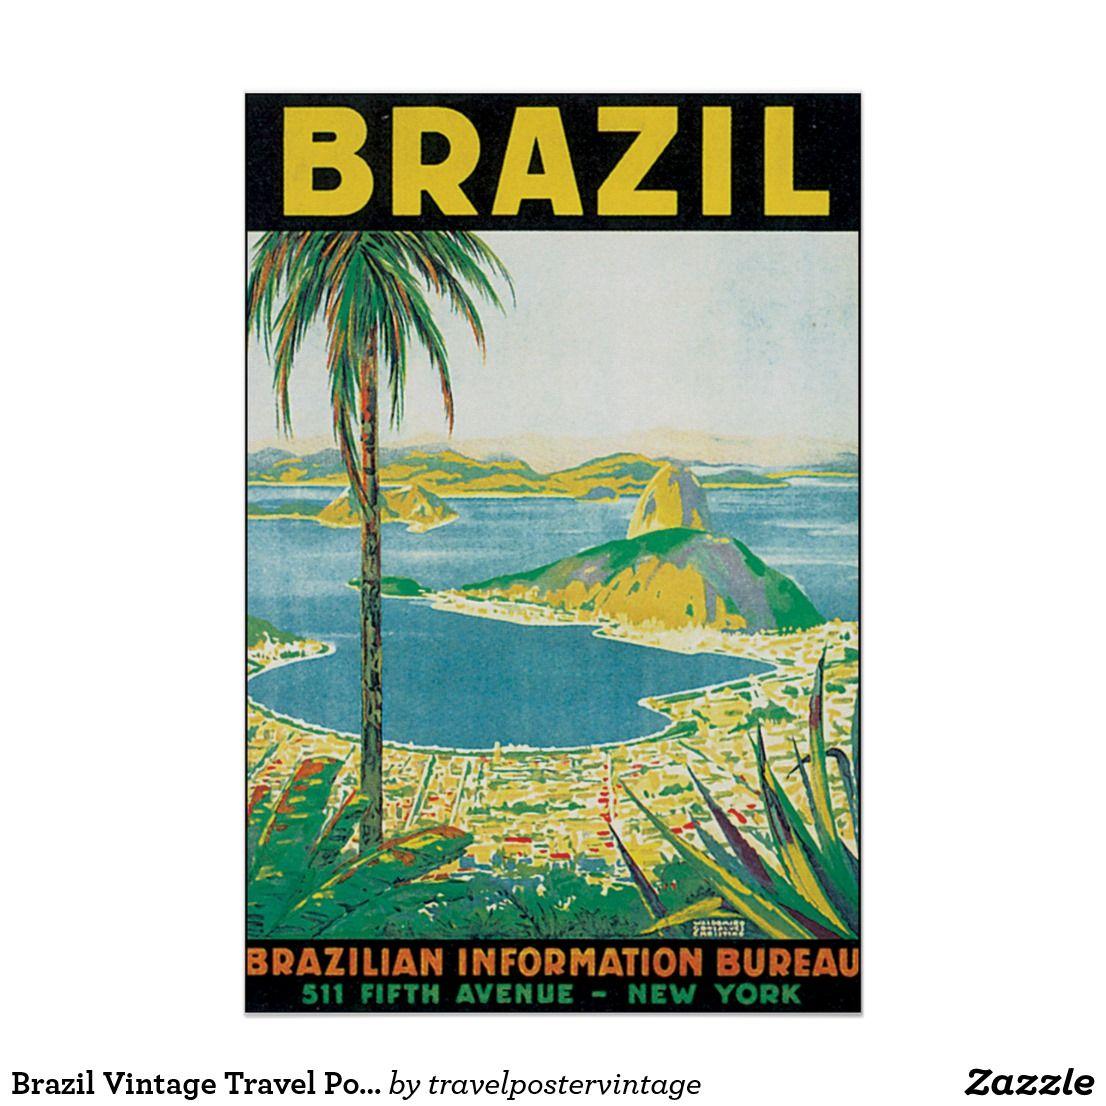 Brazil Vintage Travel Poster Zazzle Com Vintage Travel Posters